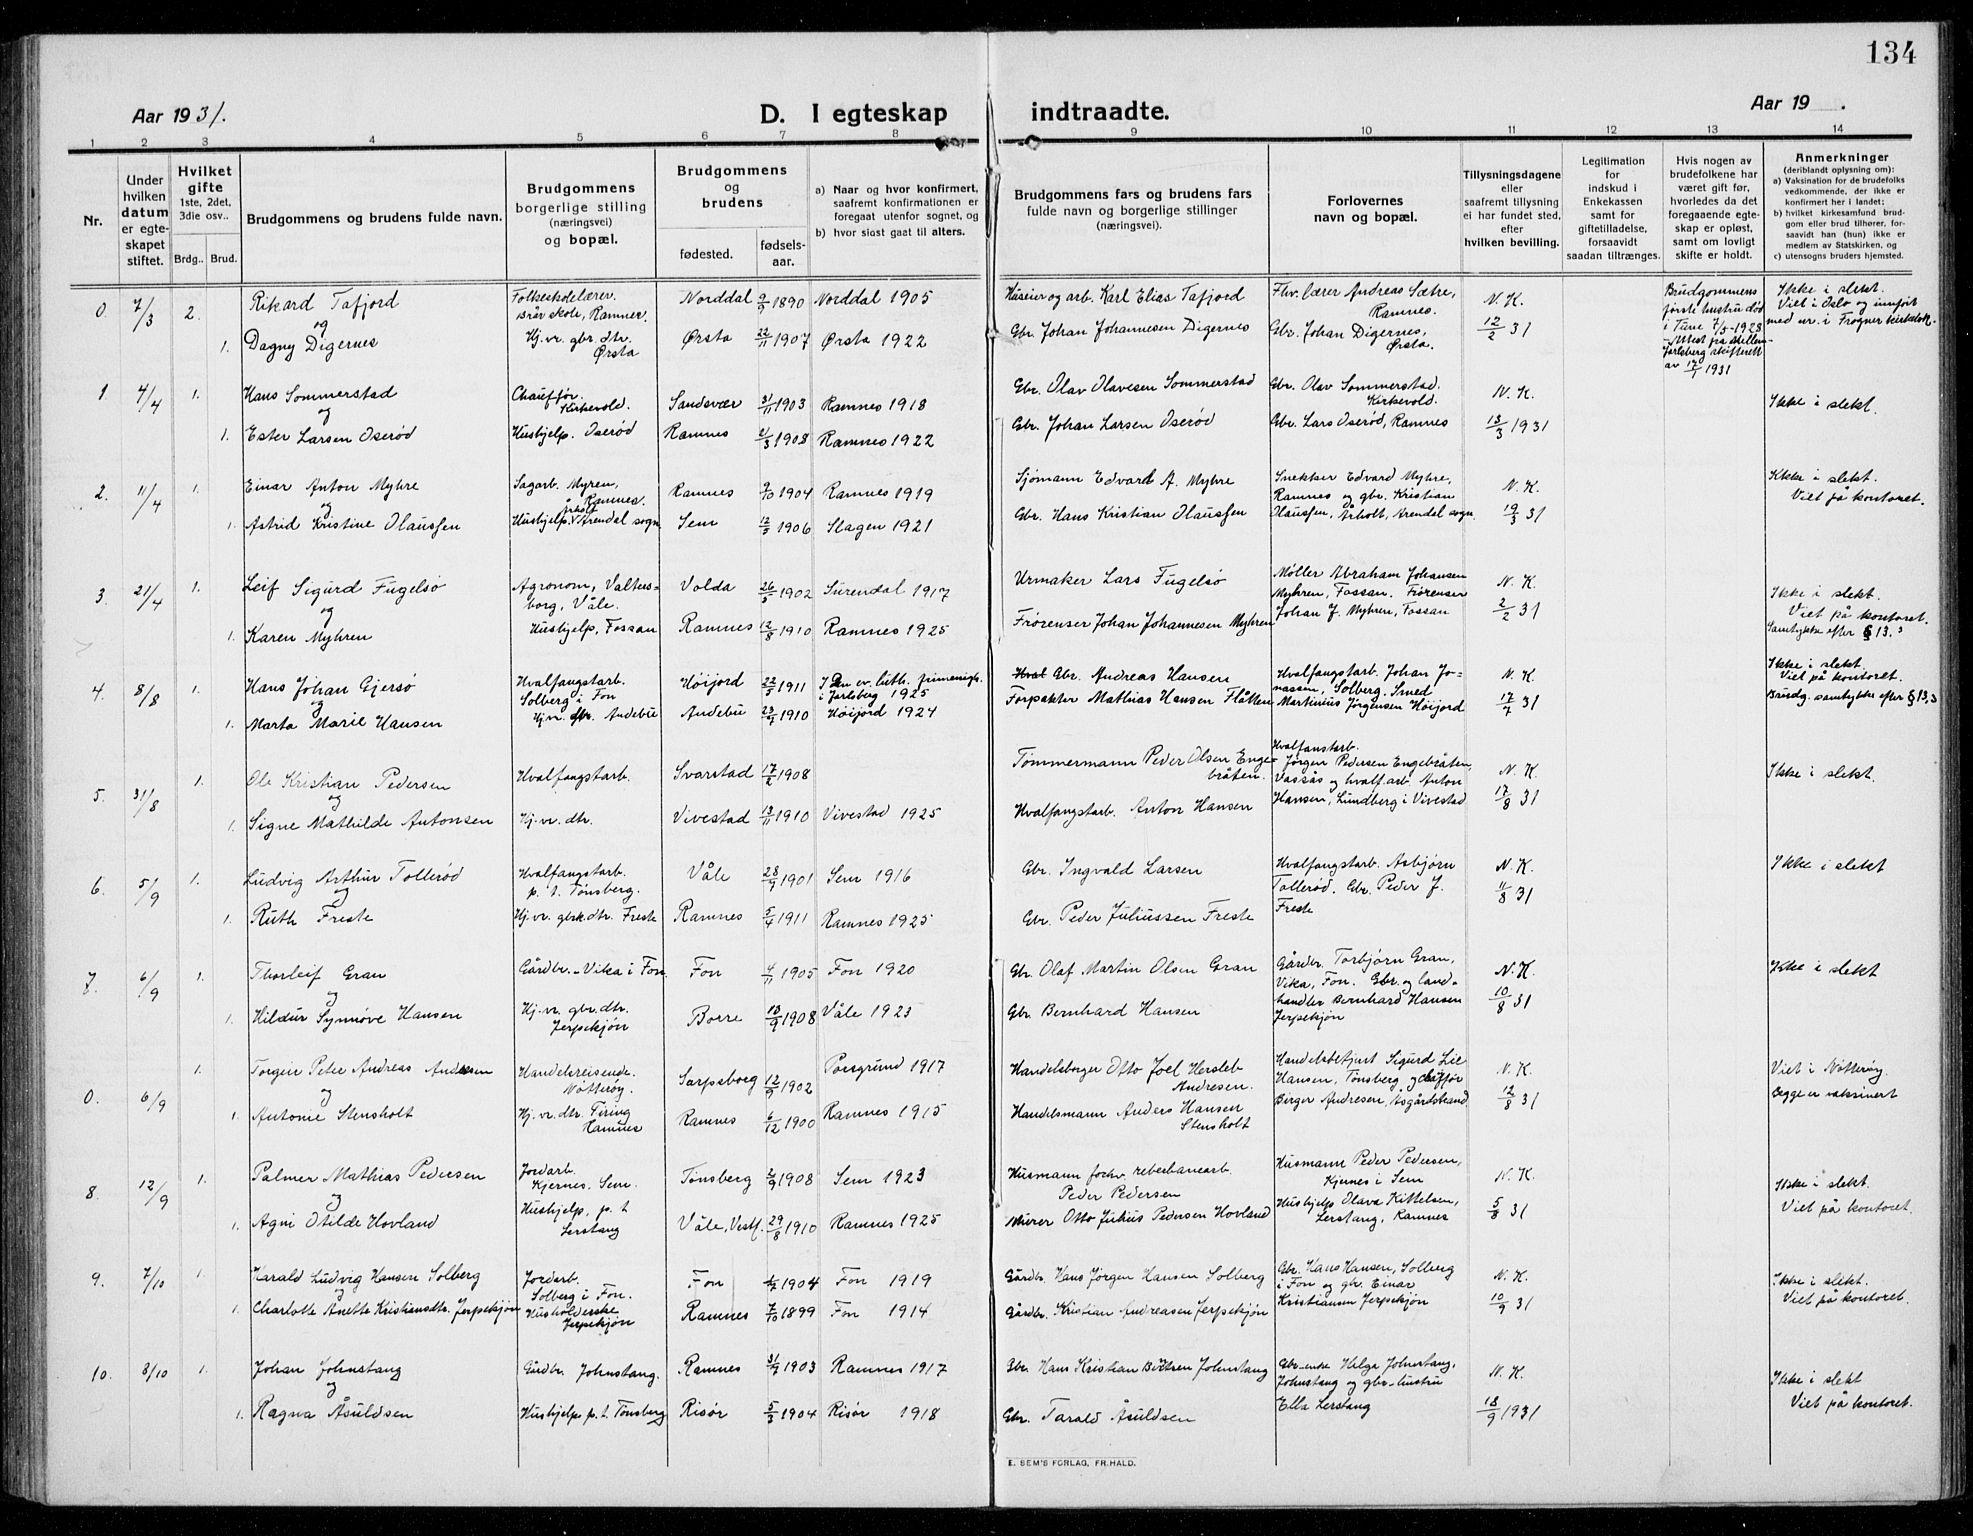 SAKO, Ramnes kirkebøker, G/Ga/L0005: Klokkerbok nr. I 5, 1912-1936, s. 134